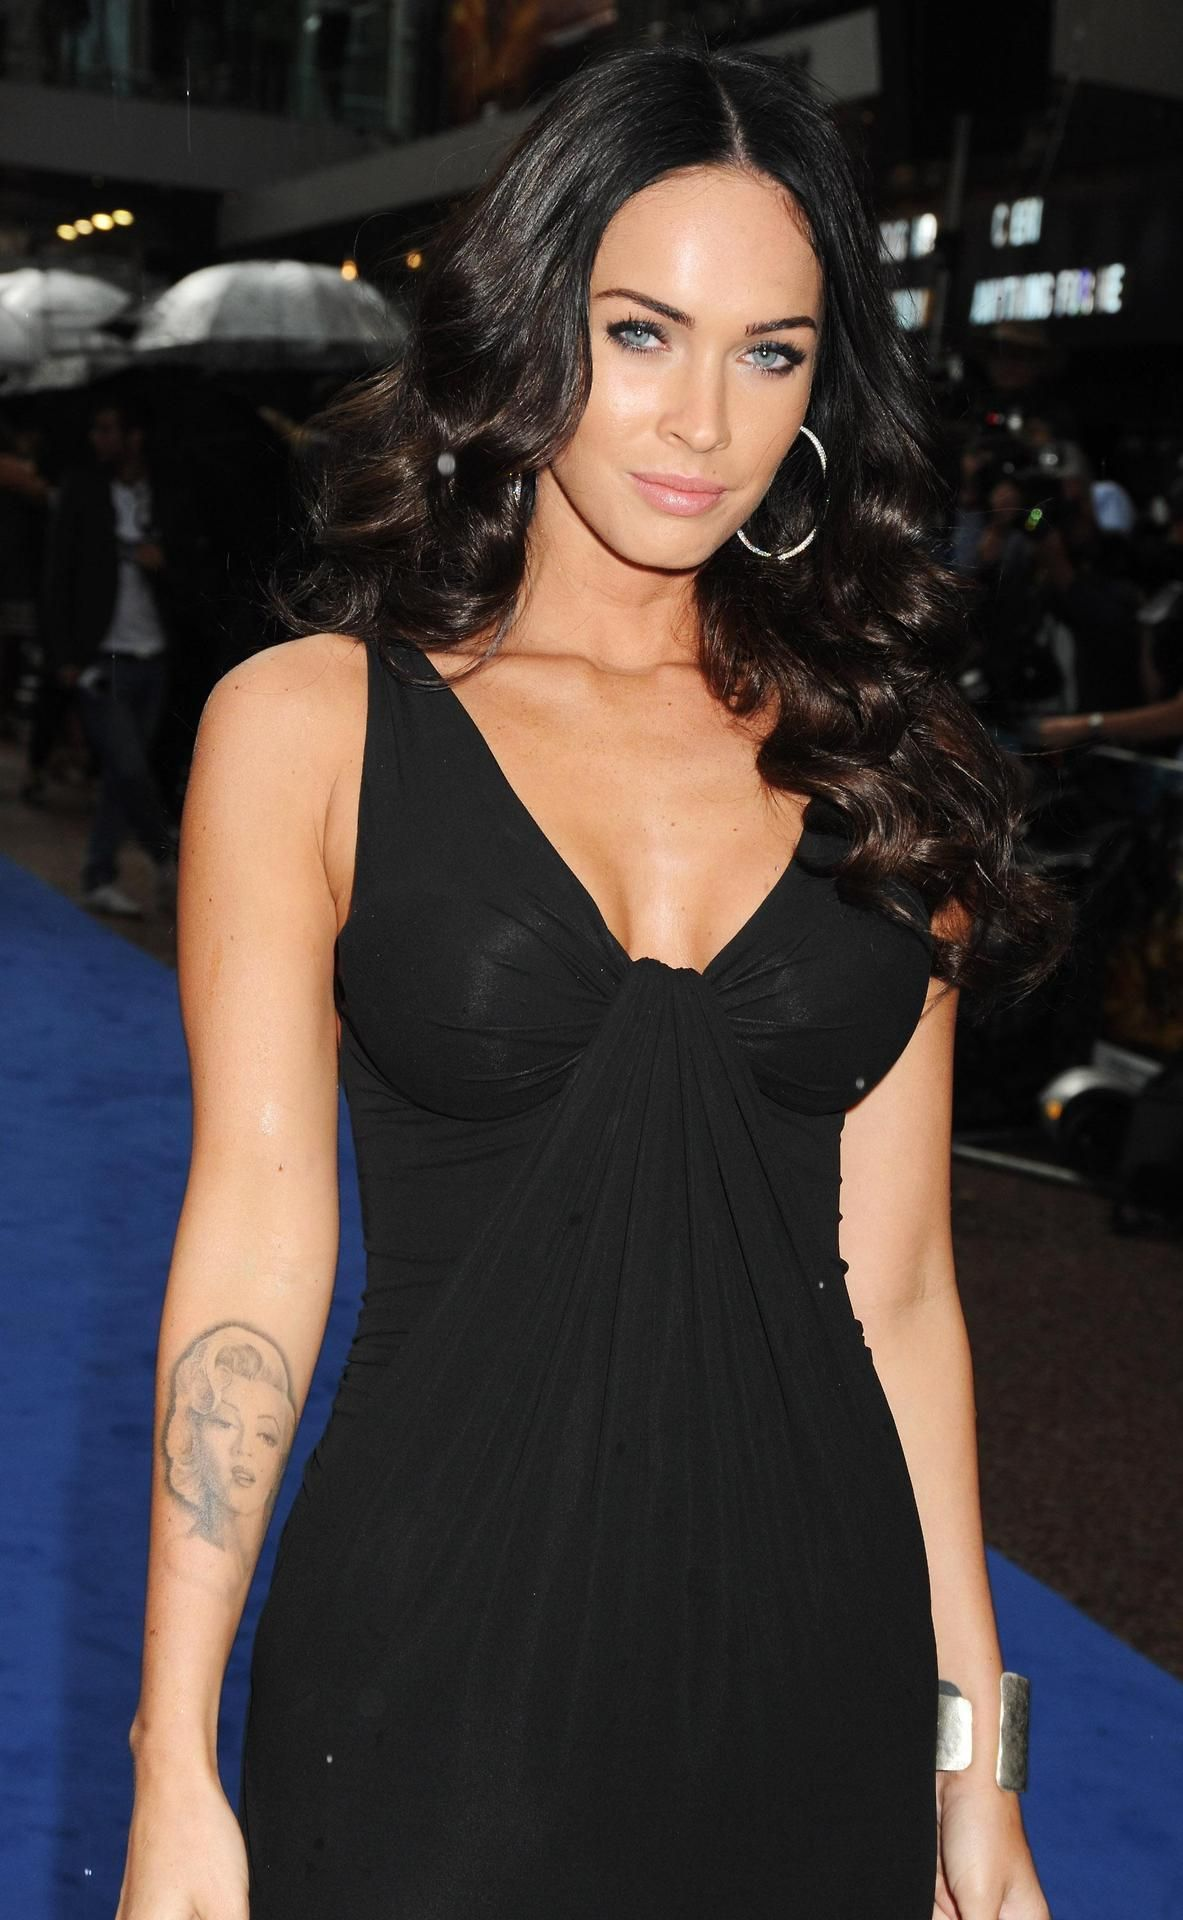 Celebrity Megan Strand nude (12 photo), Topless, Paparazzi, Boobs, braless 2015